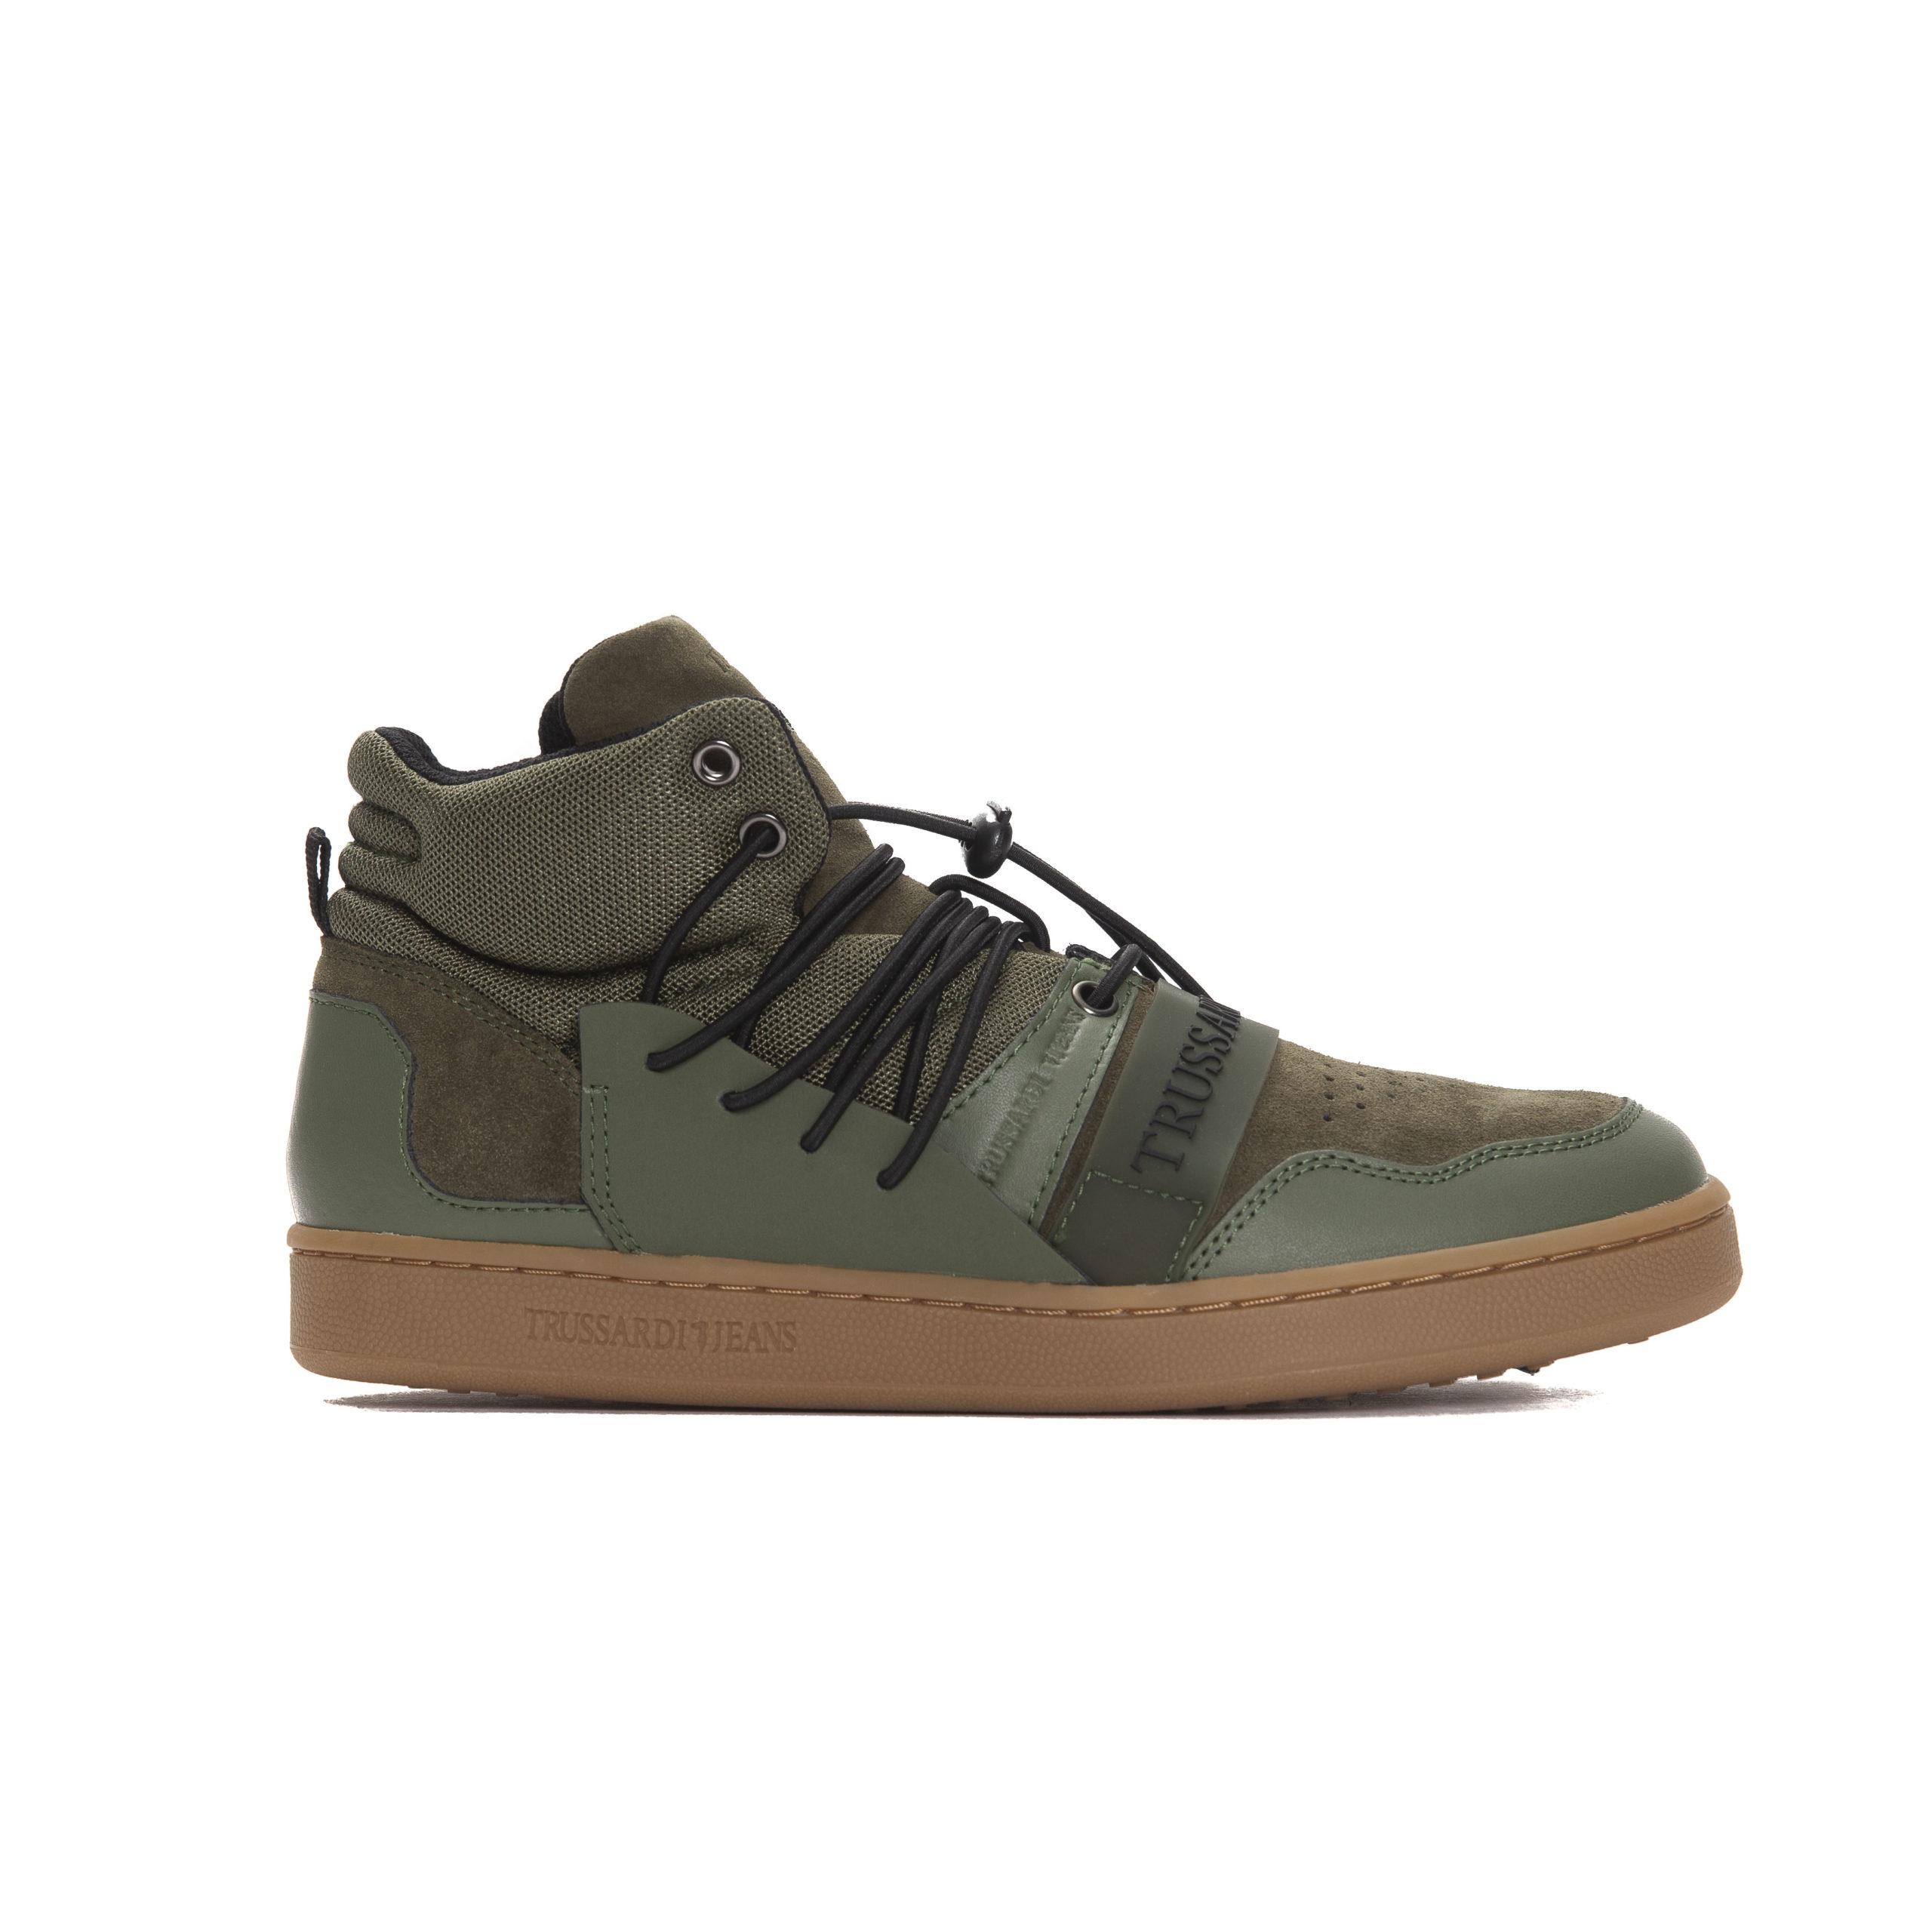 Trussardi Jeans Men's Mil. Military Trainer Army TR1006565 - EU40/US7